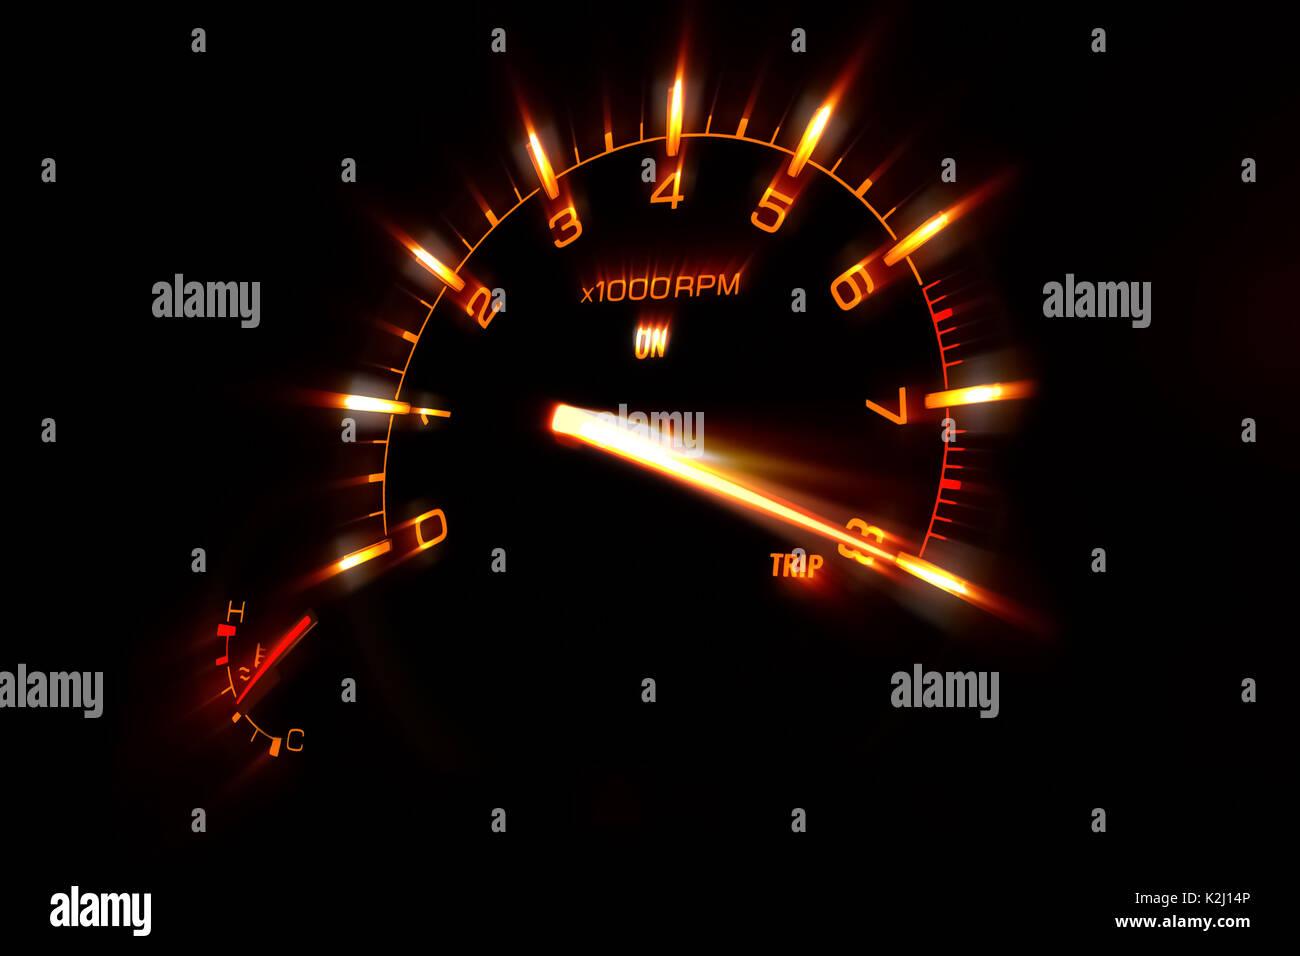 Speedometer Of A Car At Maximum Speed Stock Photo 156518678 Alamy